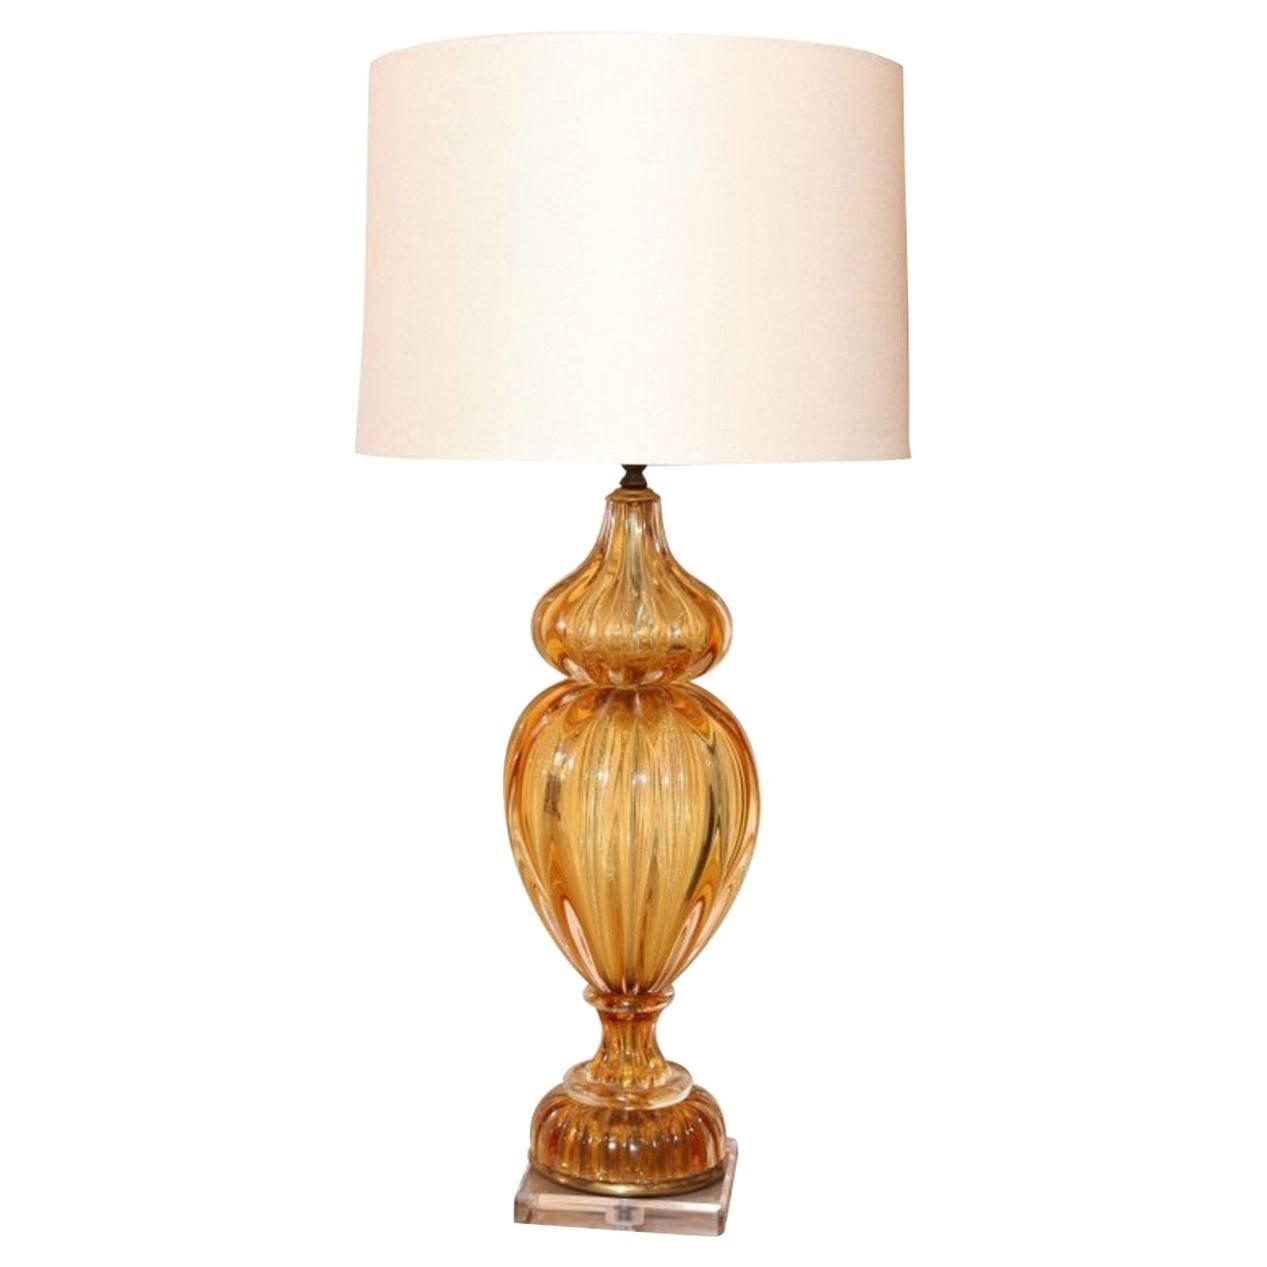 Murano Amber Color Glass Lamp by Masbro